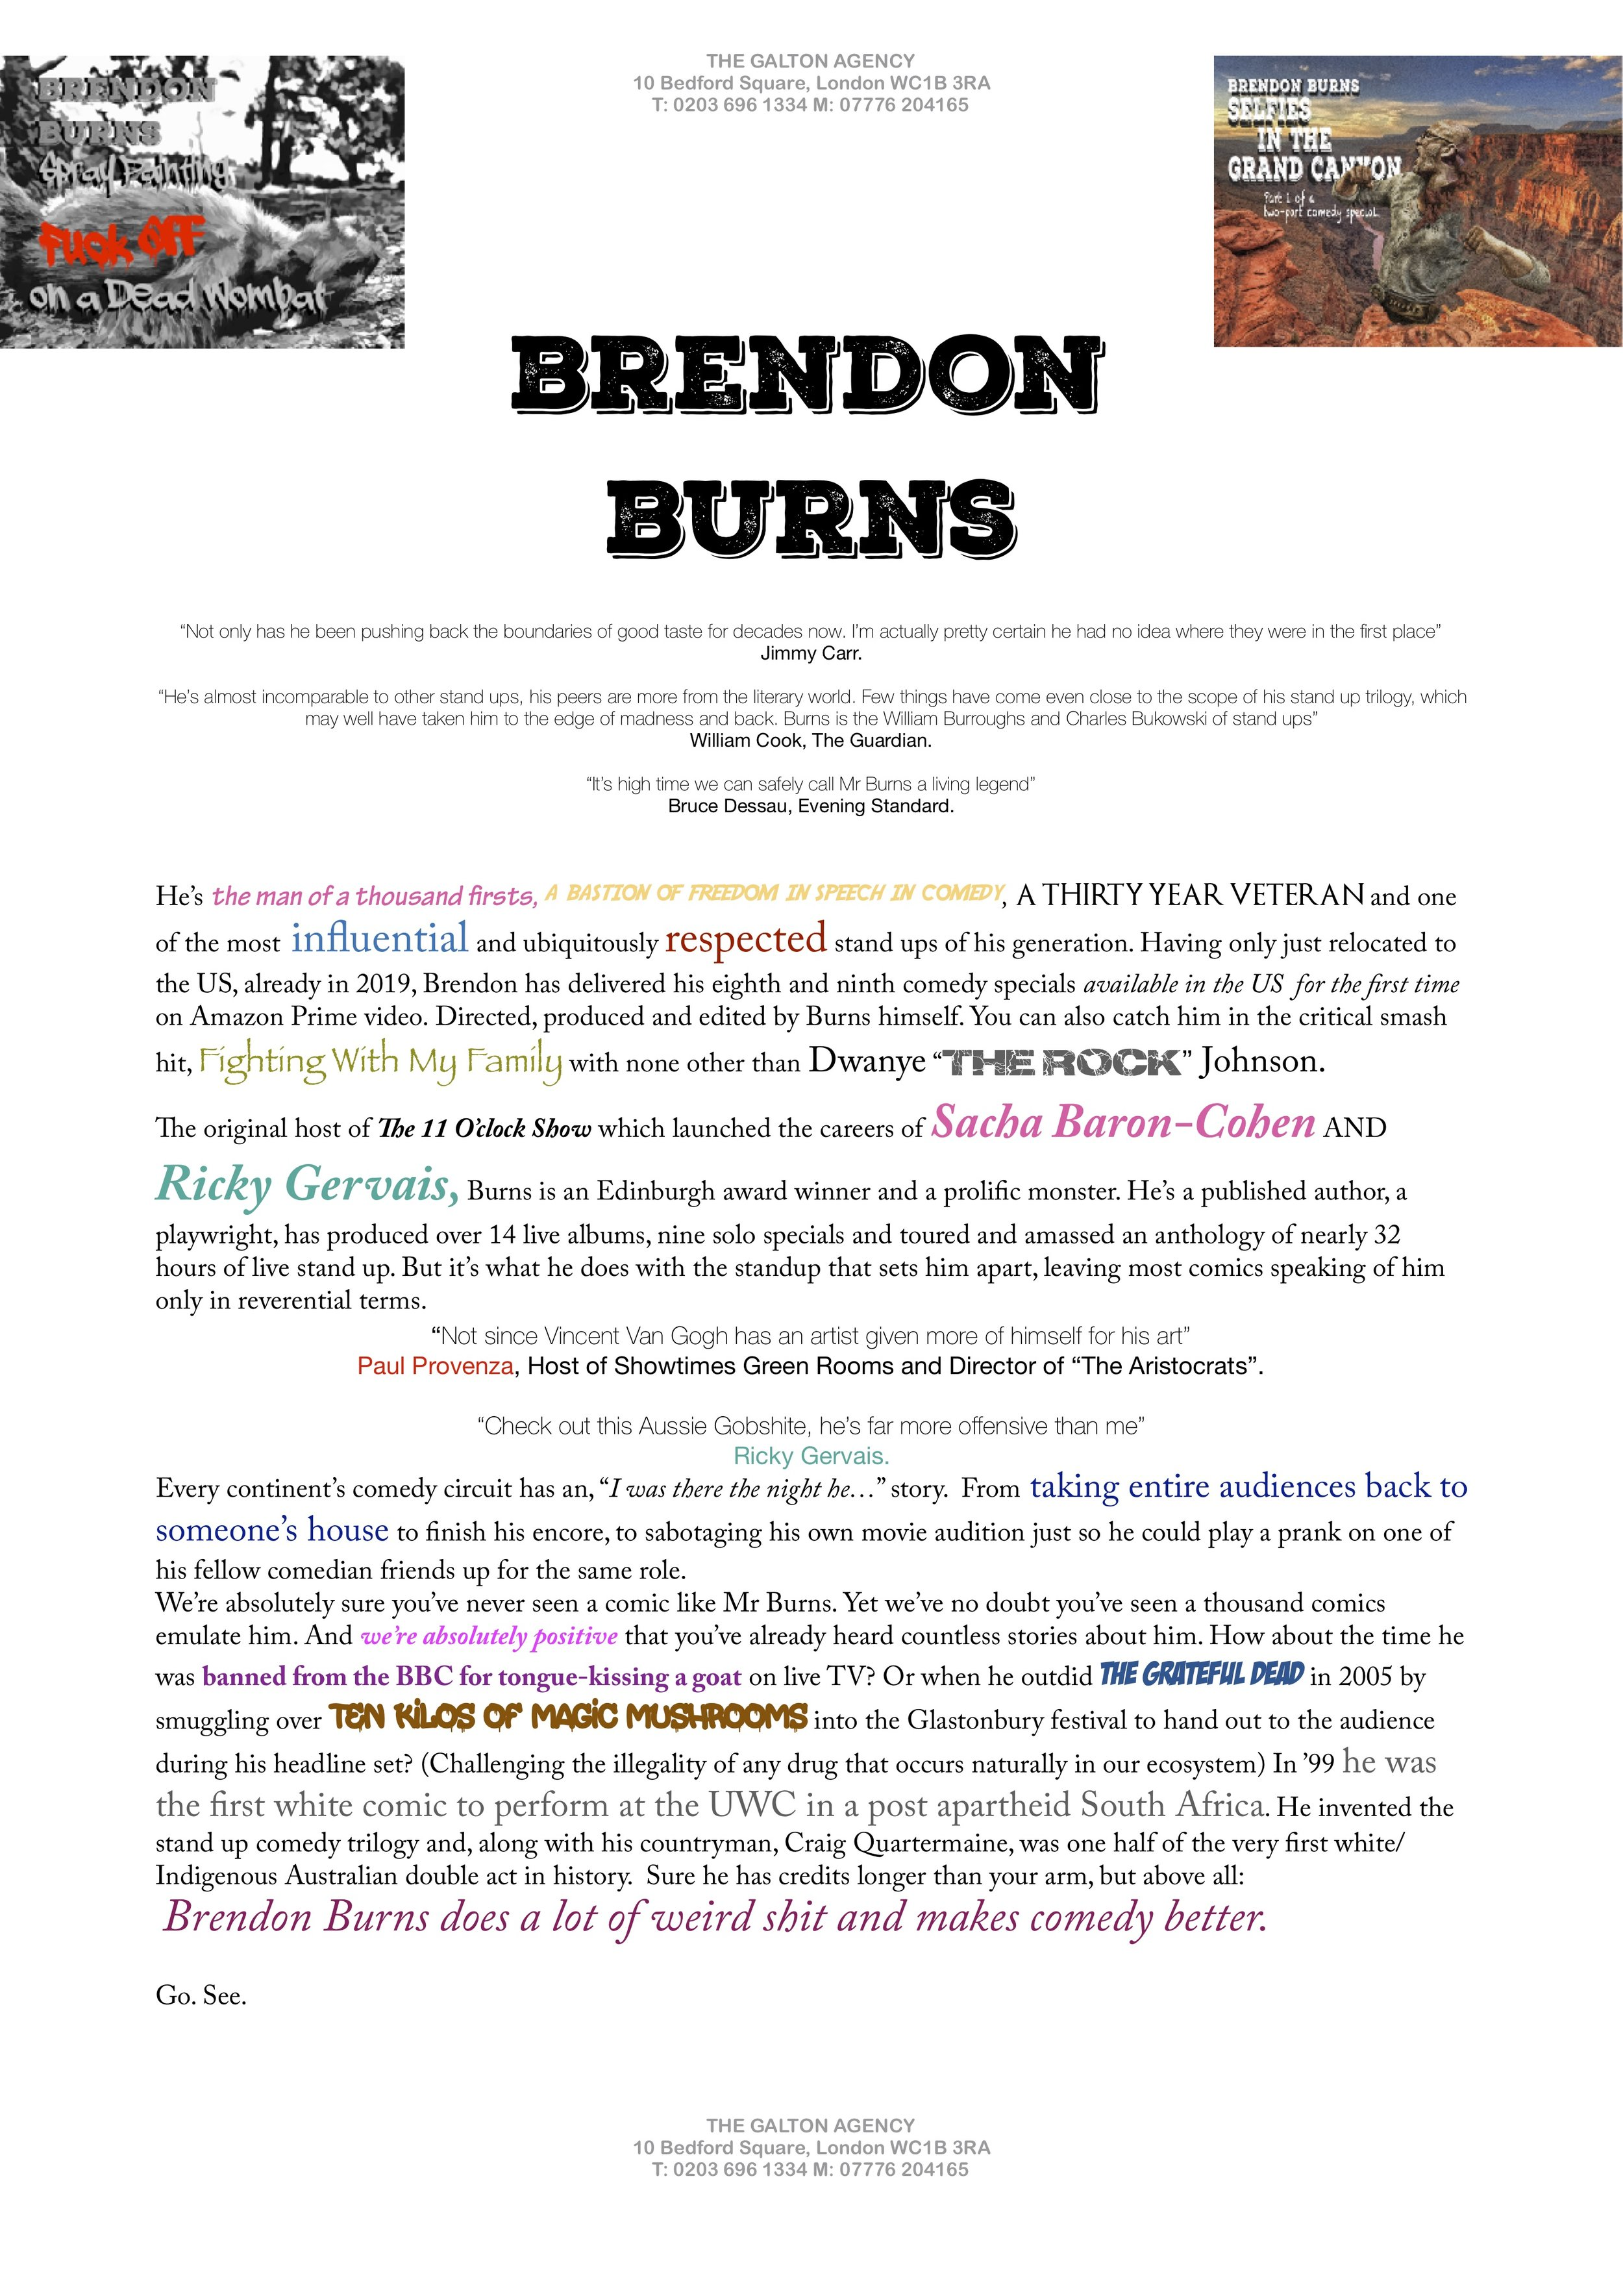 Brendon Burns bio 2019.jpg